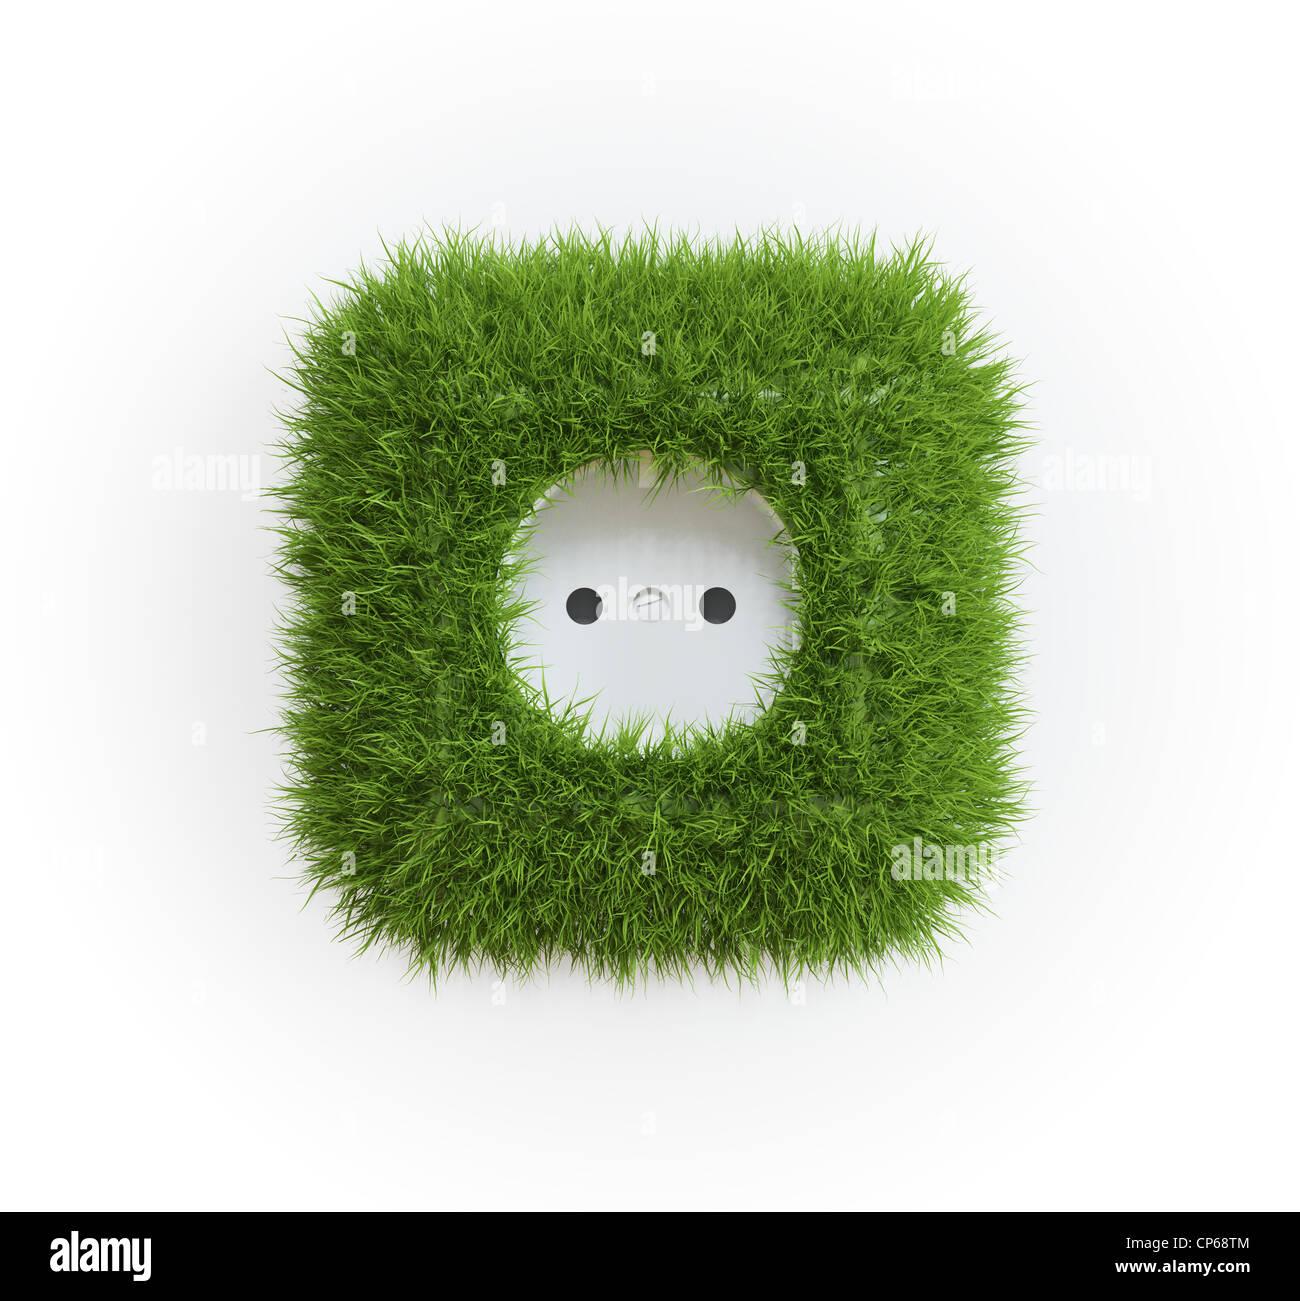 Ricoperto di erba outlet - Energie rinnovabili concettoFoto Stock